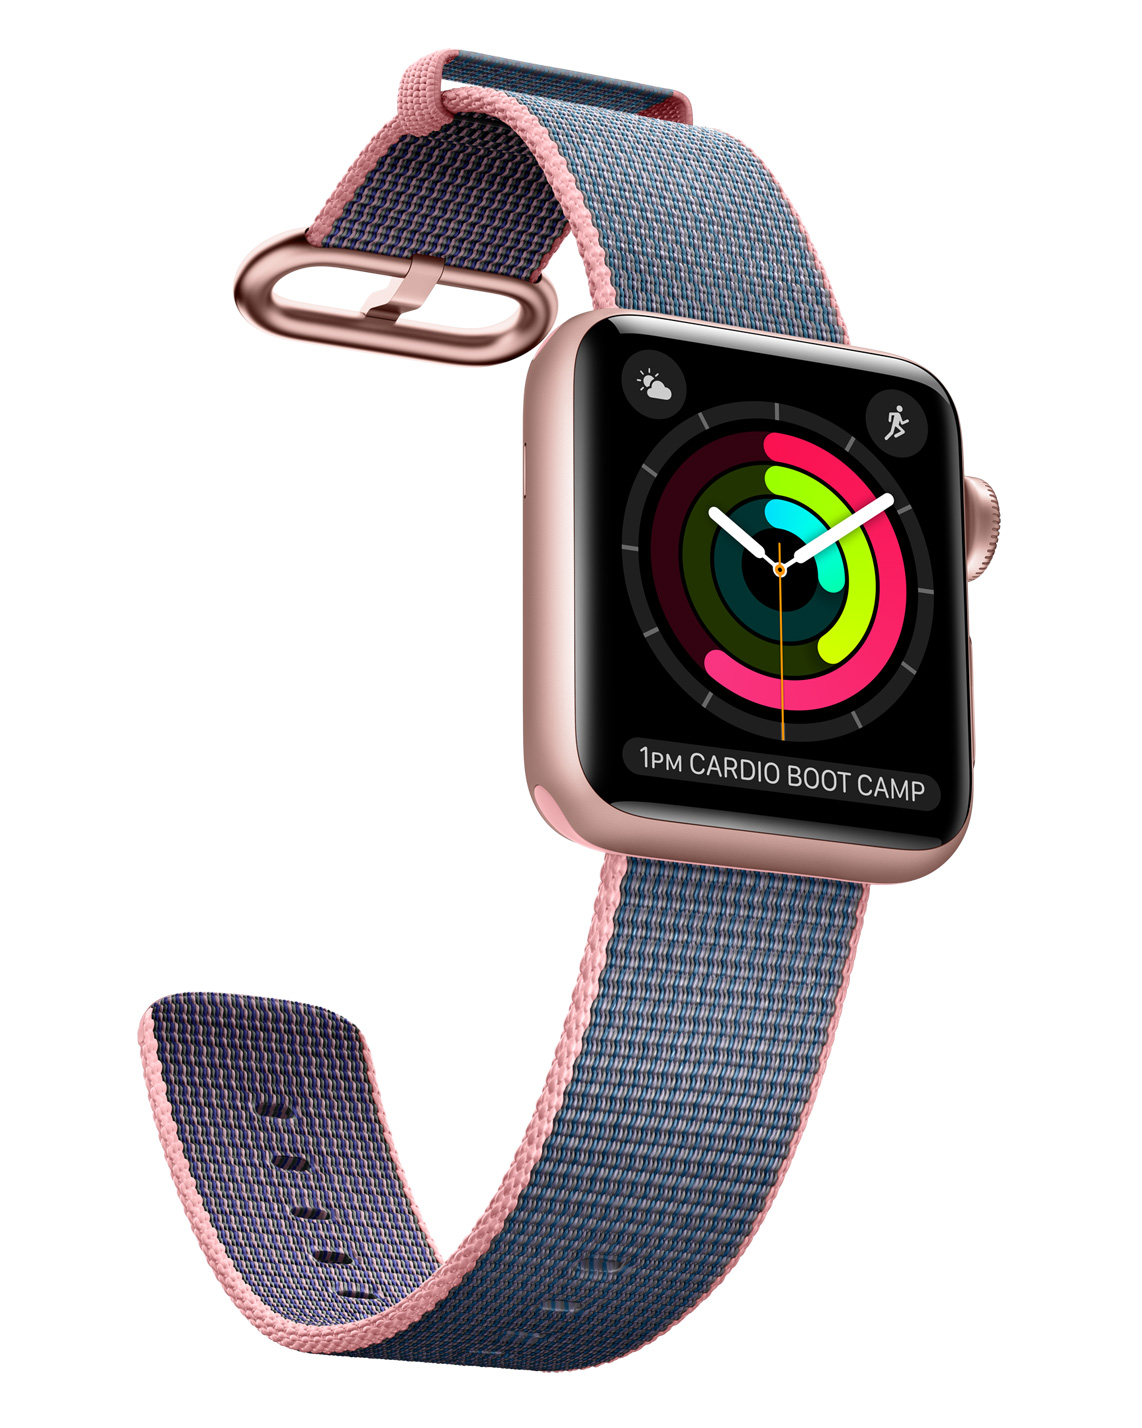 apple-watch2-rosegold.jpg